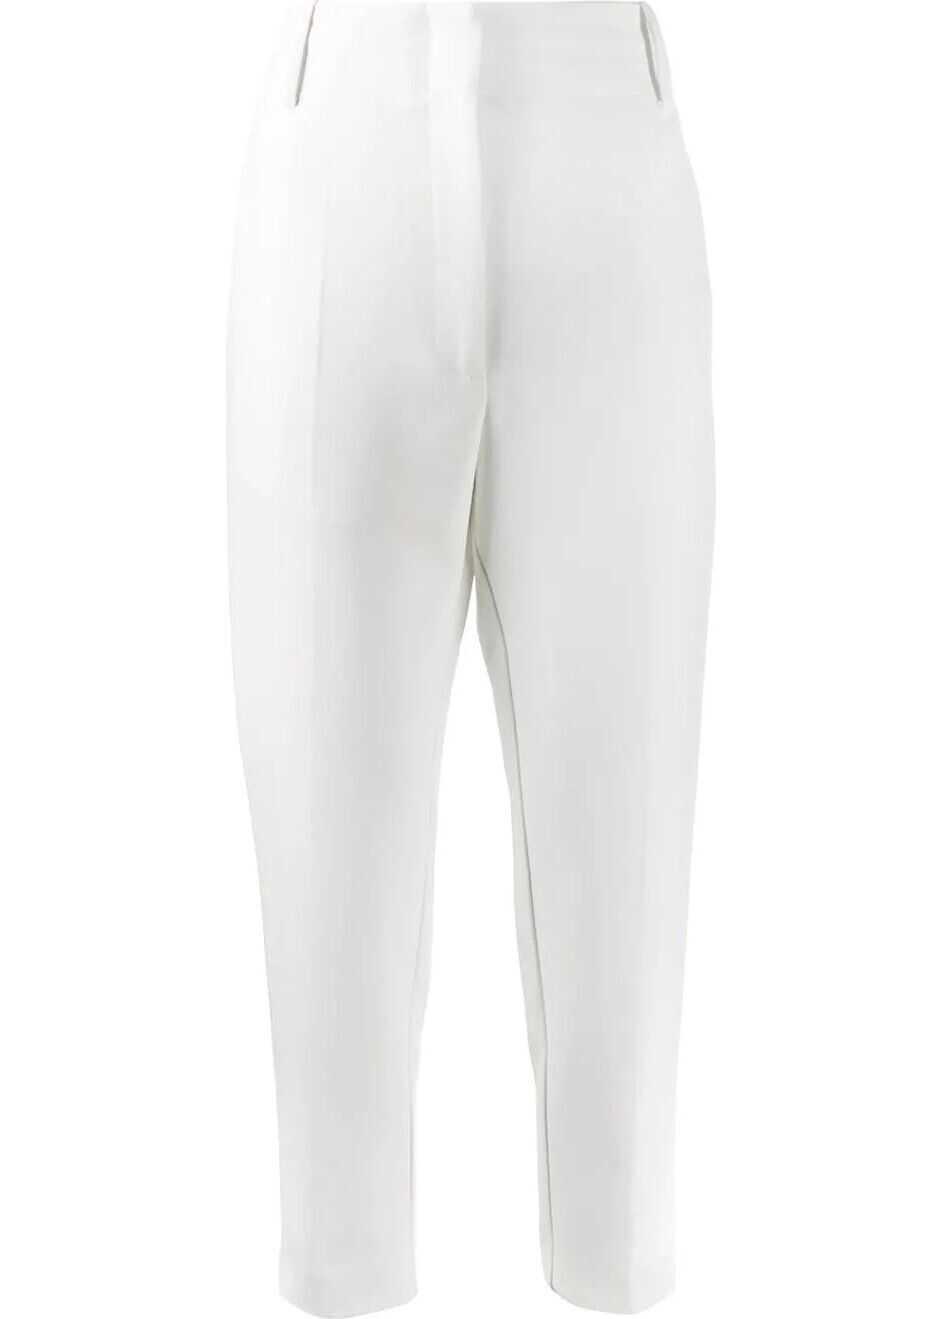 Pinko Polyester Pants WHITE